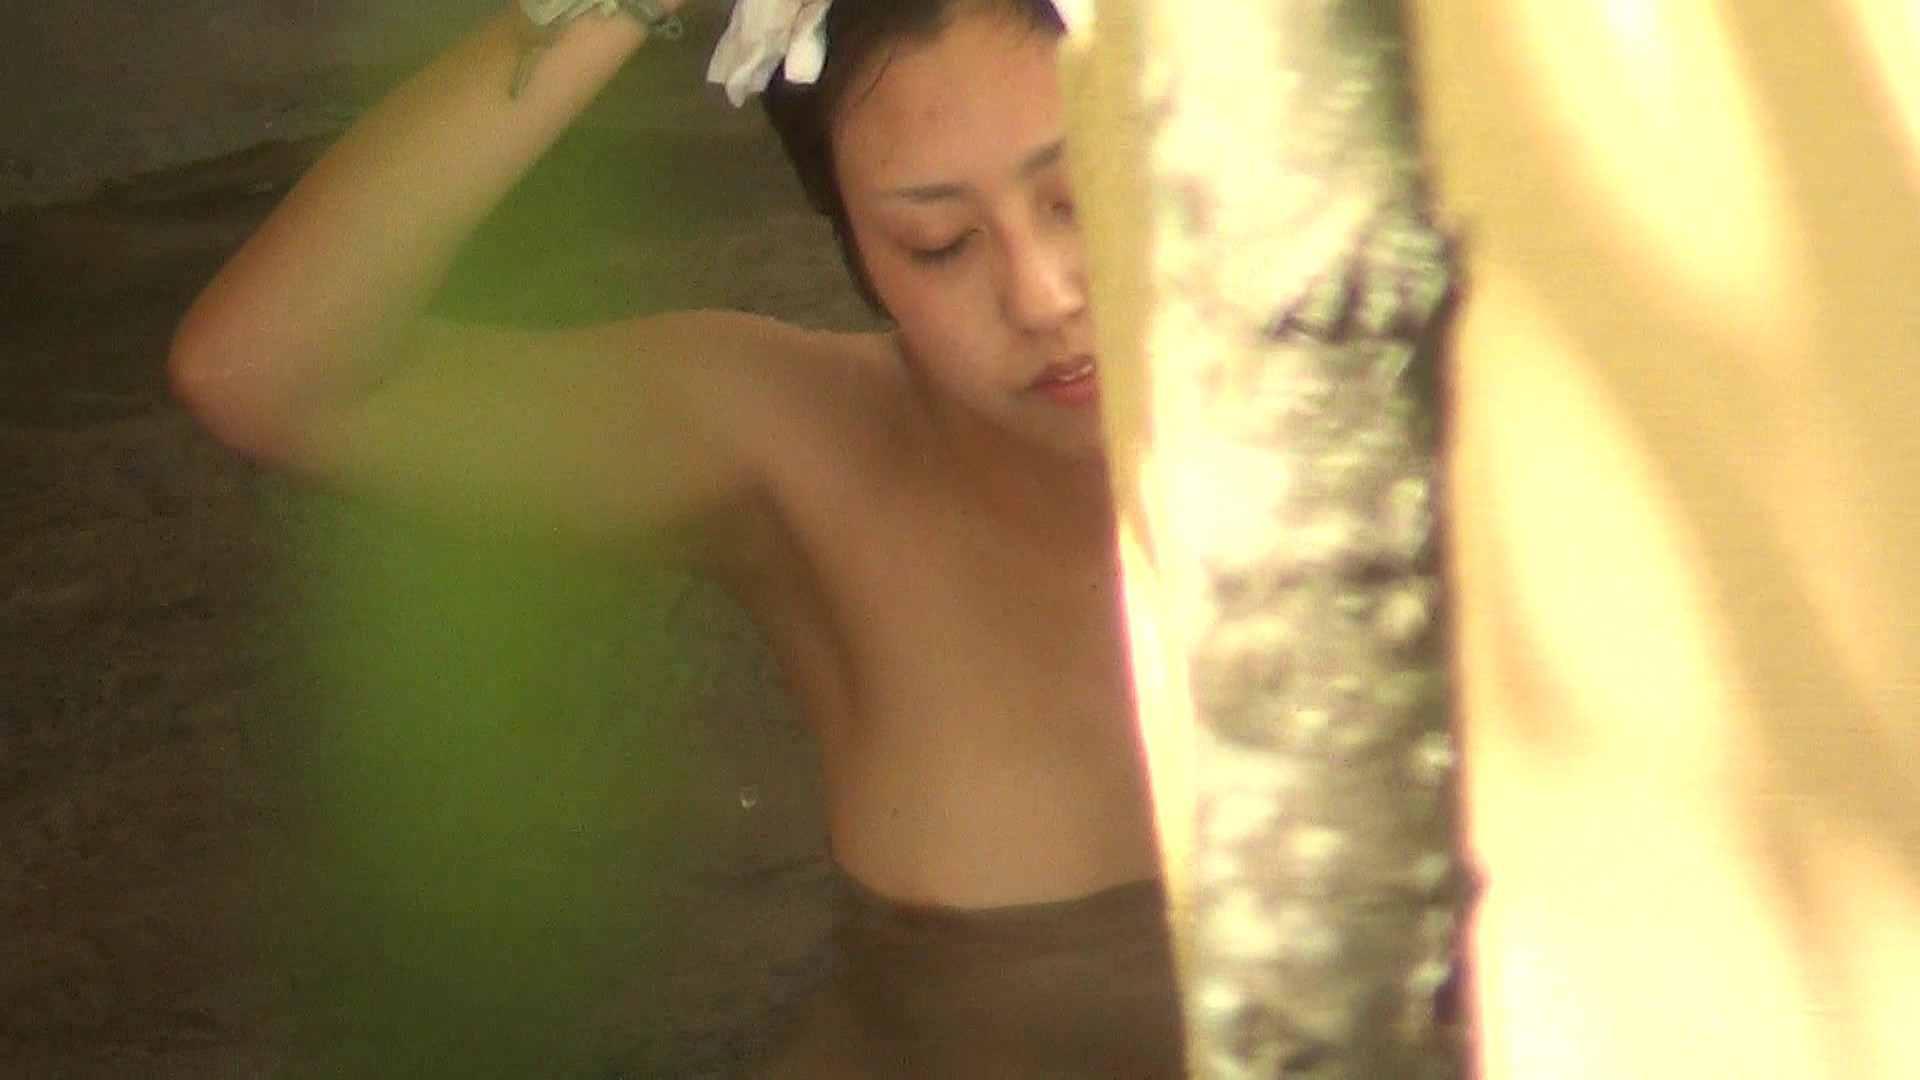 Aquaな露天風呂Vol.243 OLのエロ生活   露天風呂  57連発 34